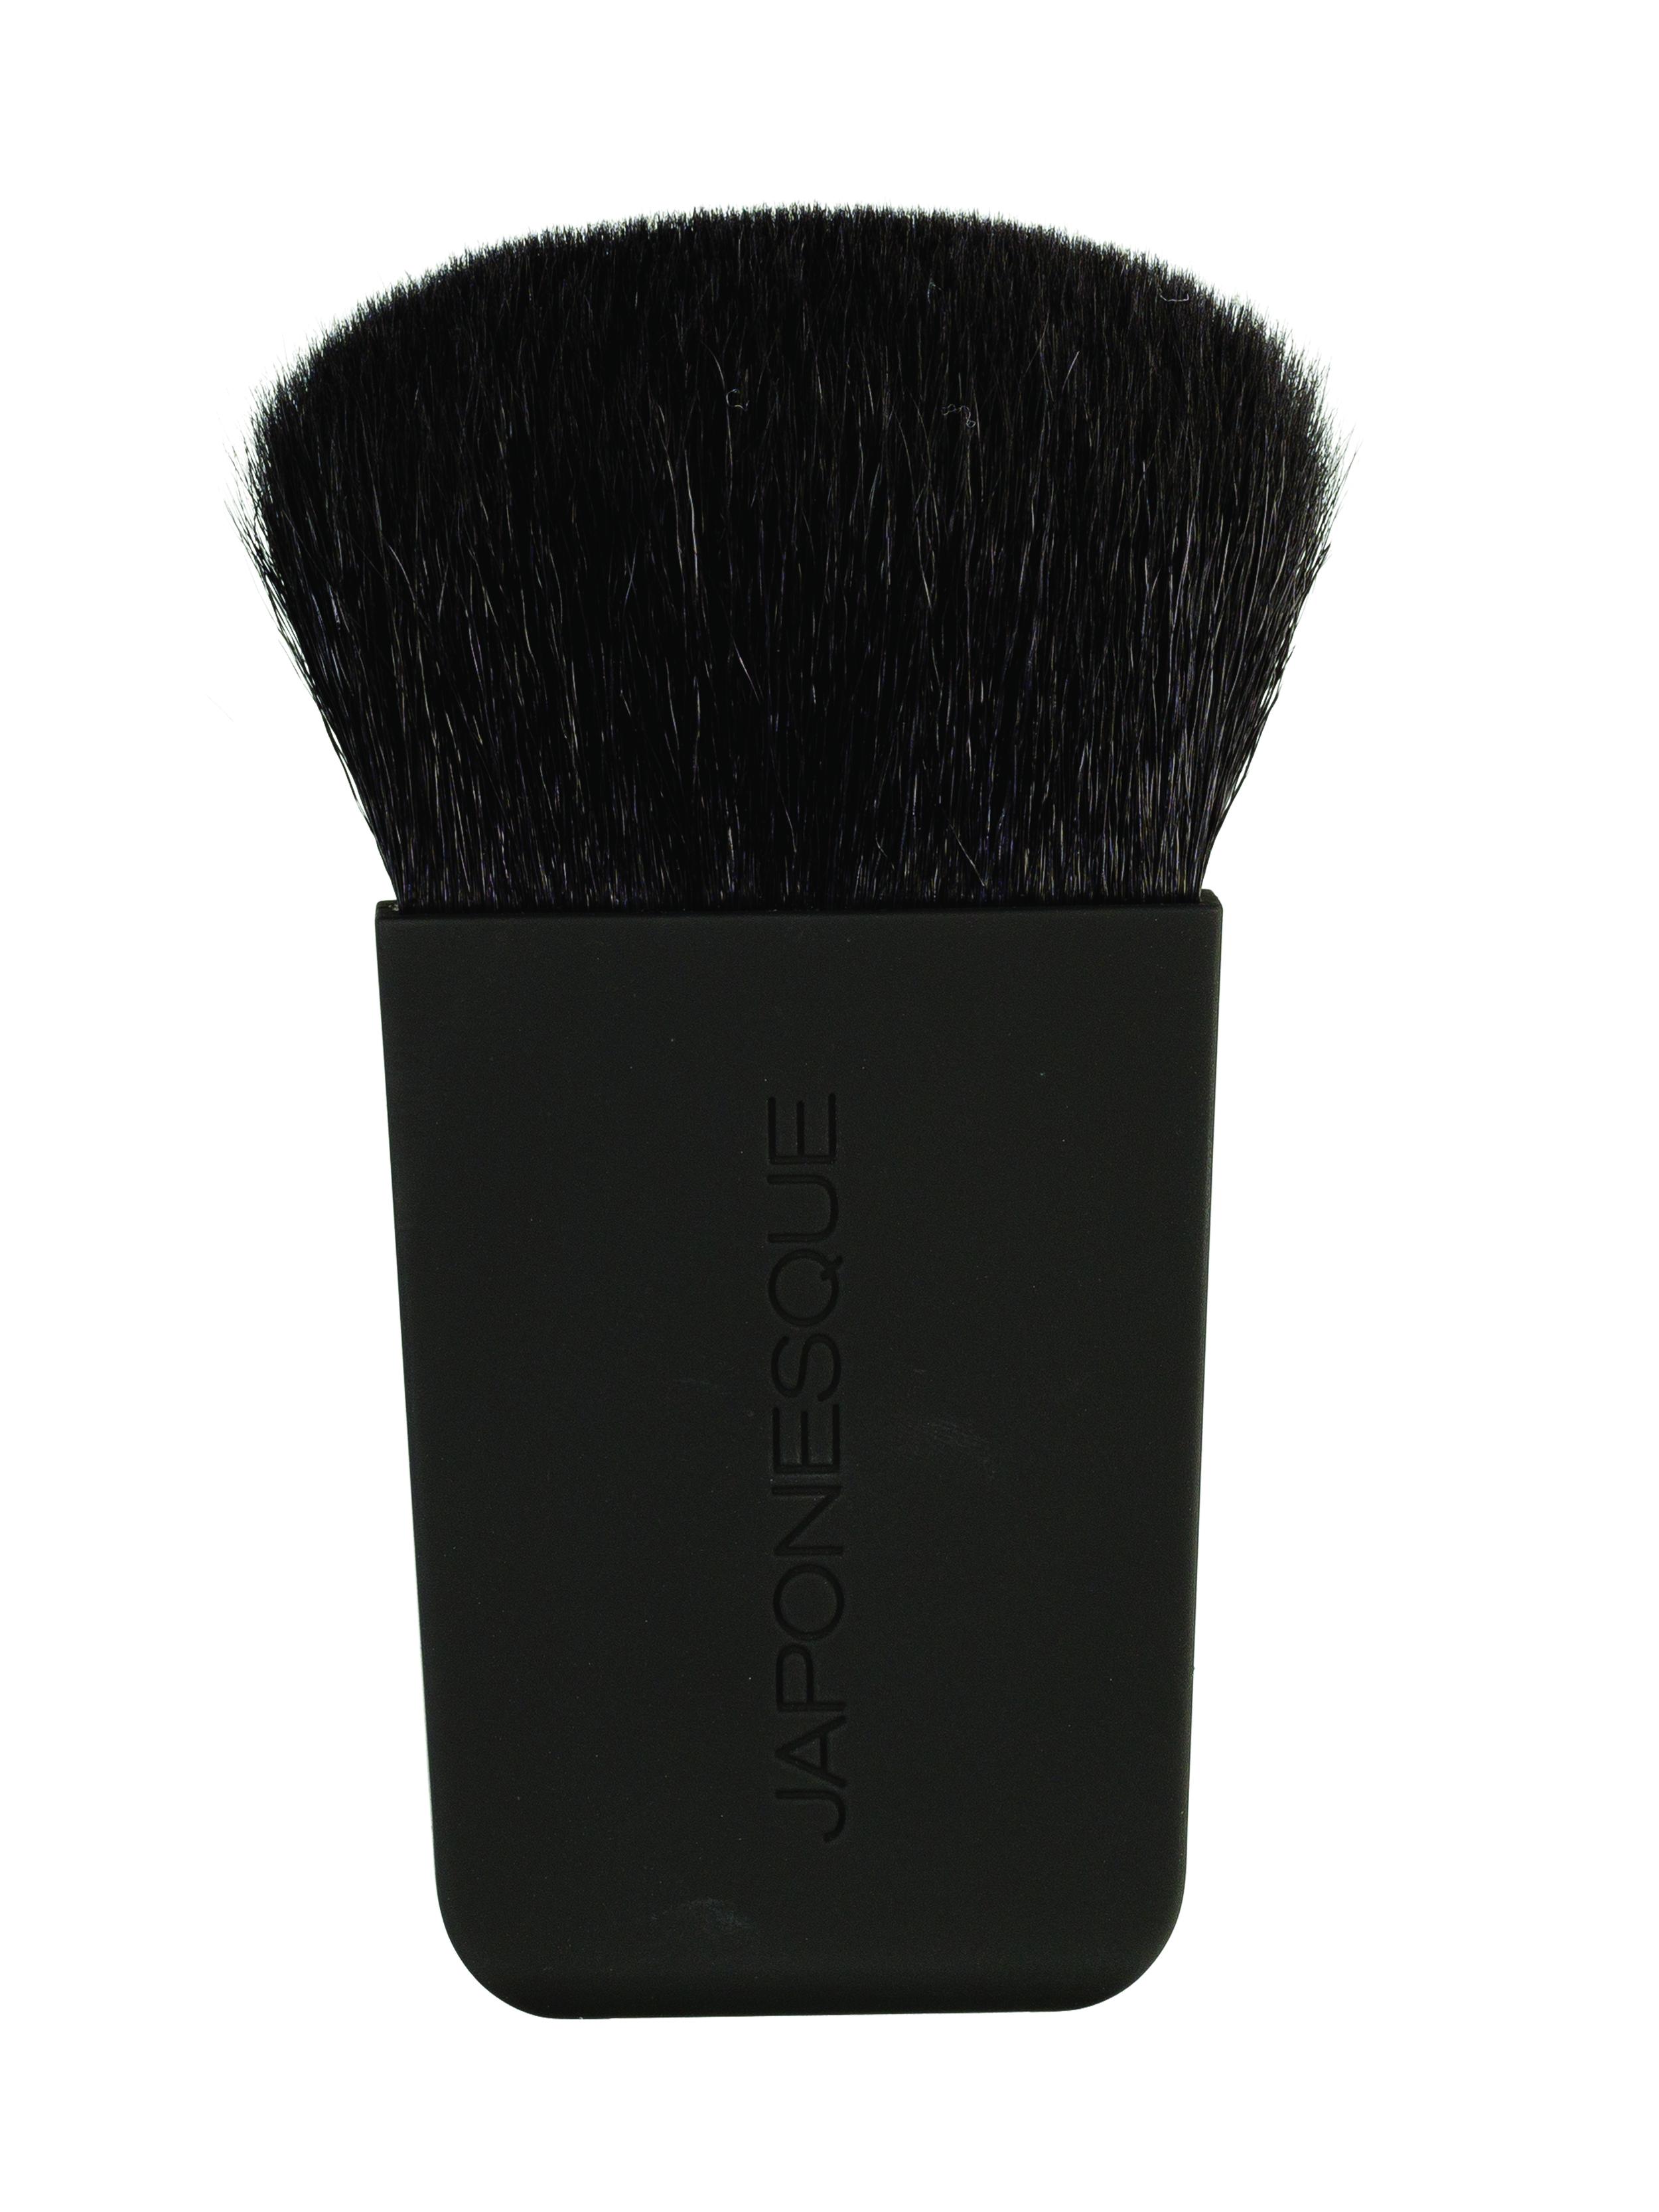 Japonesque Kumadori Blending Brush.jpg